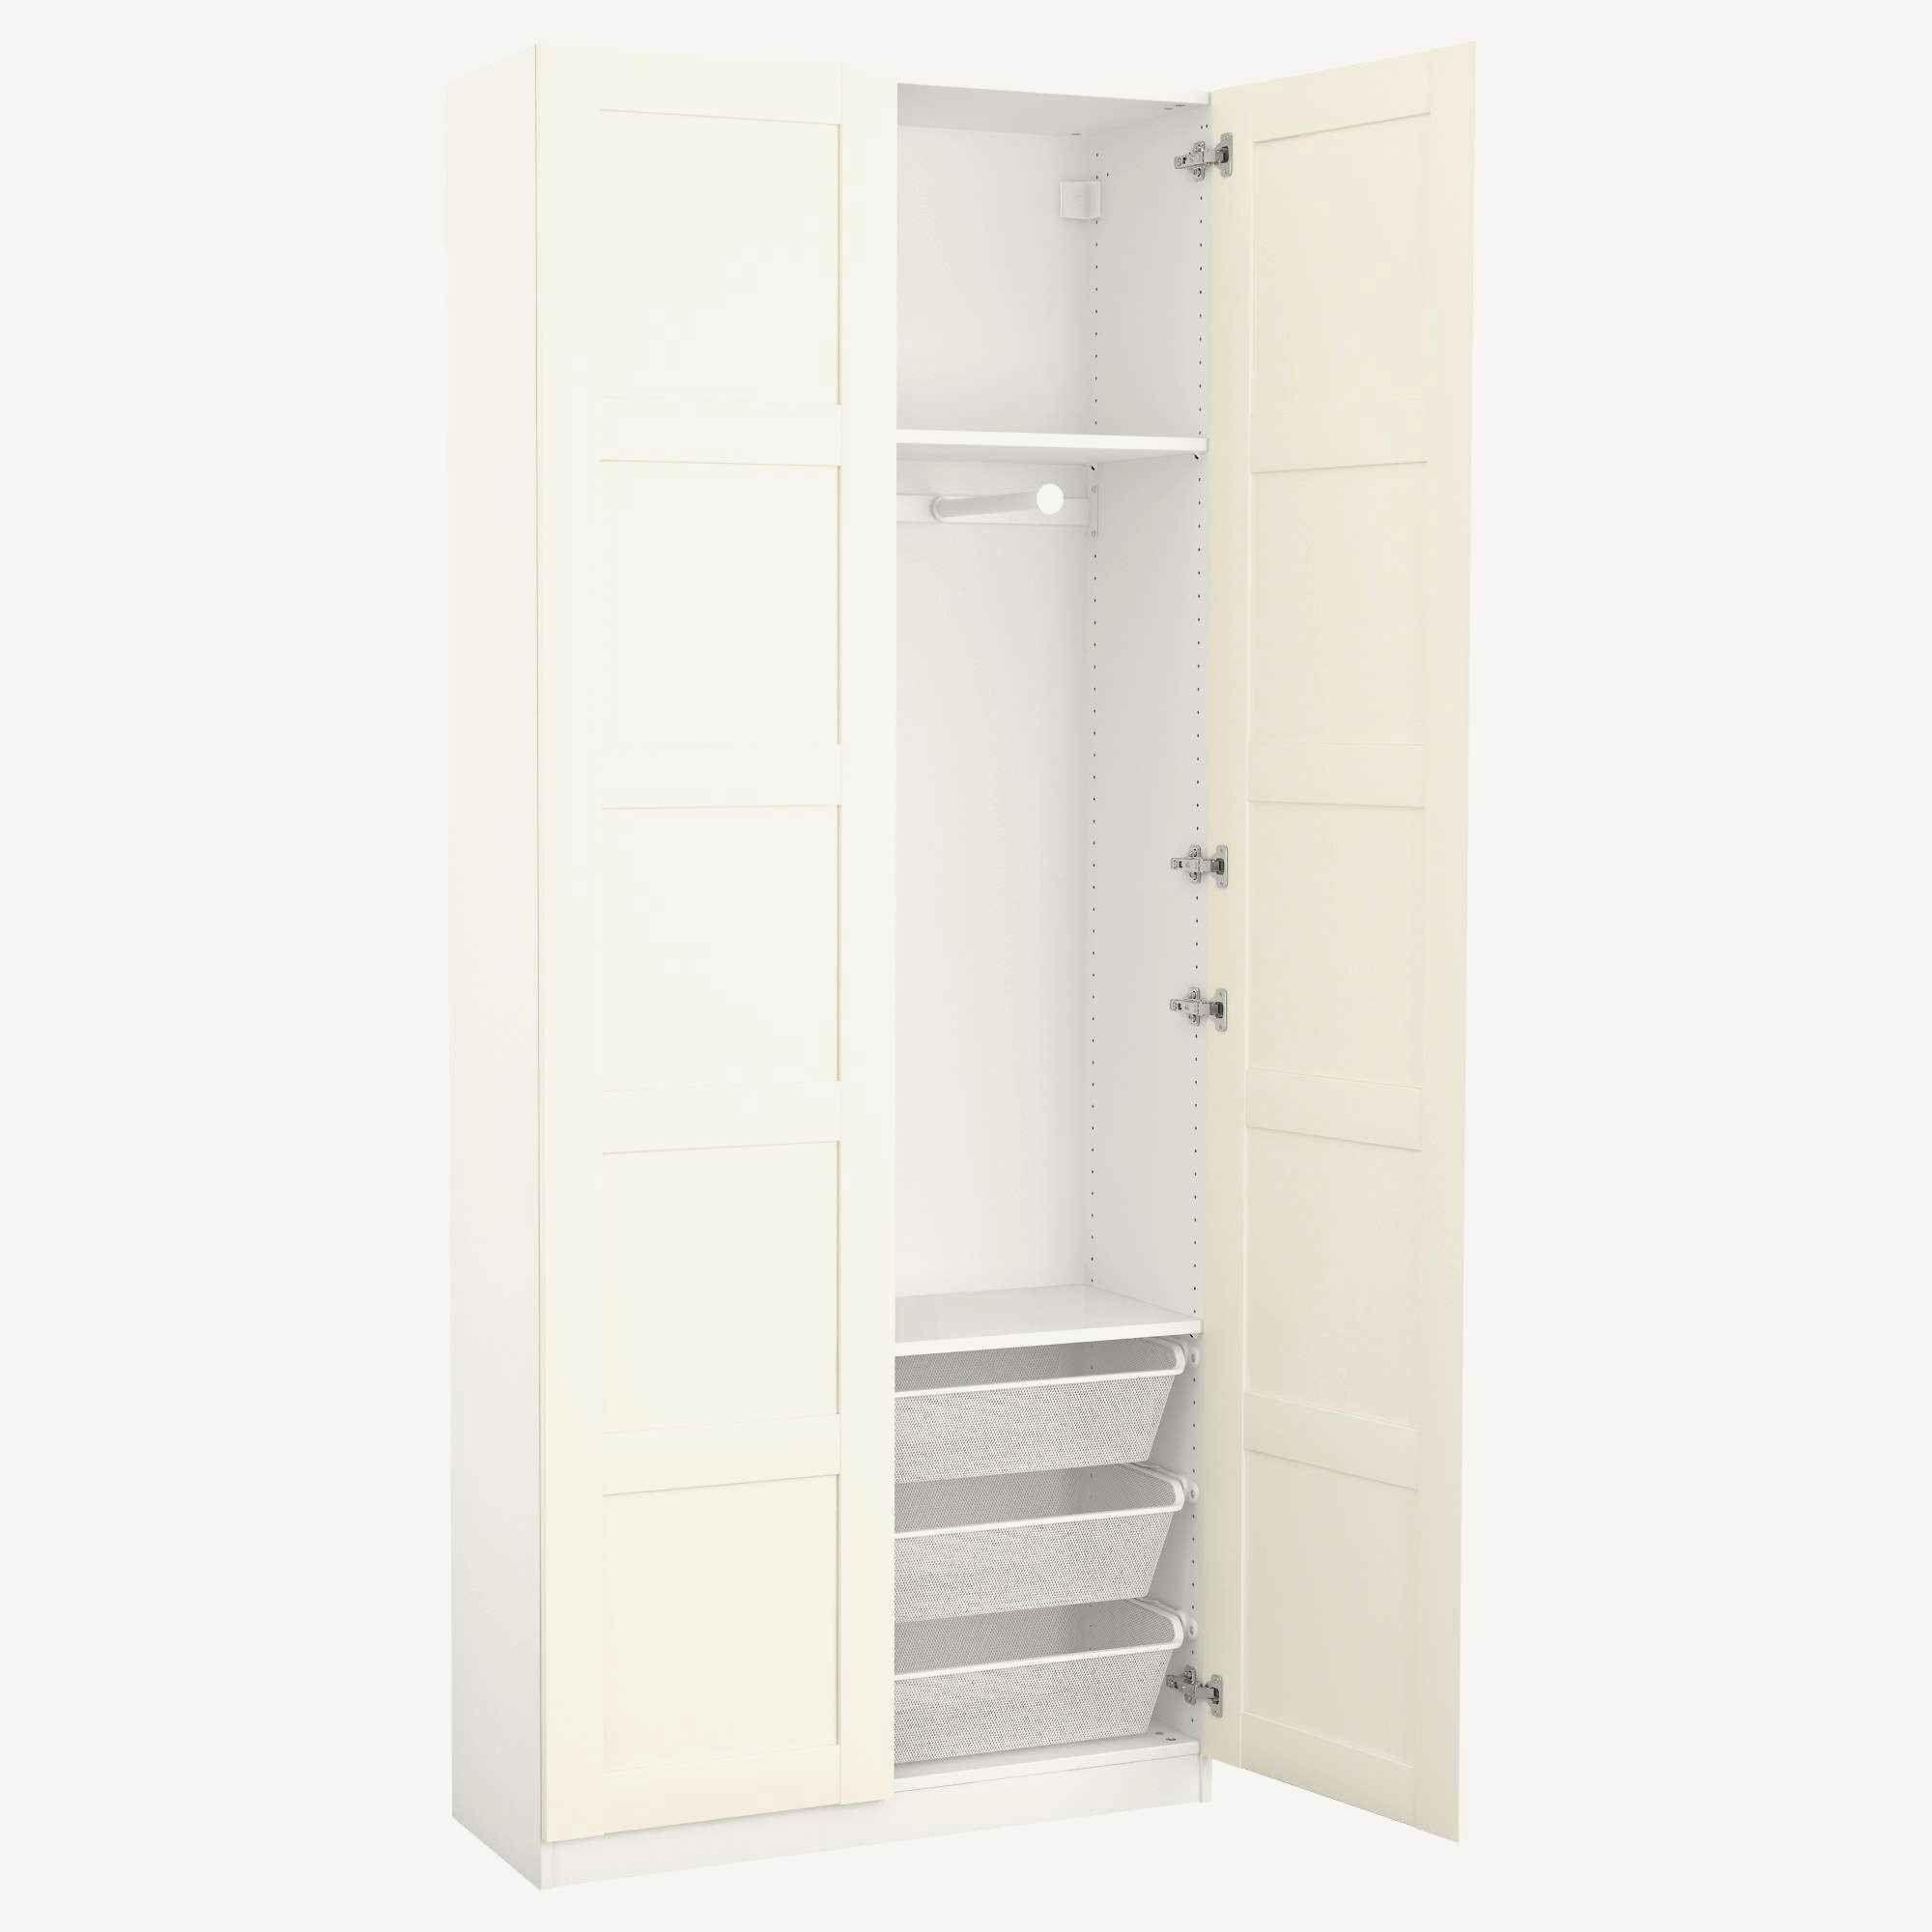 Ikea Kommode 80 Cm Breit 2021